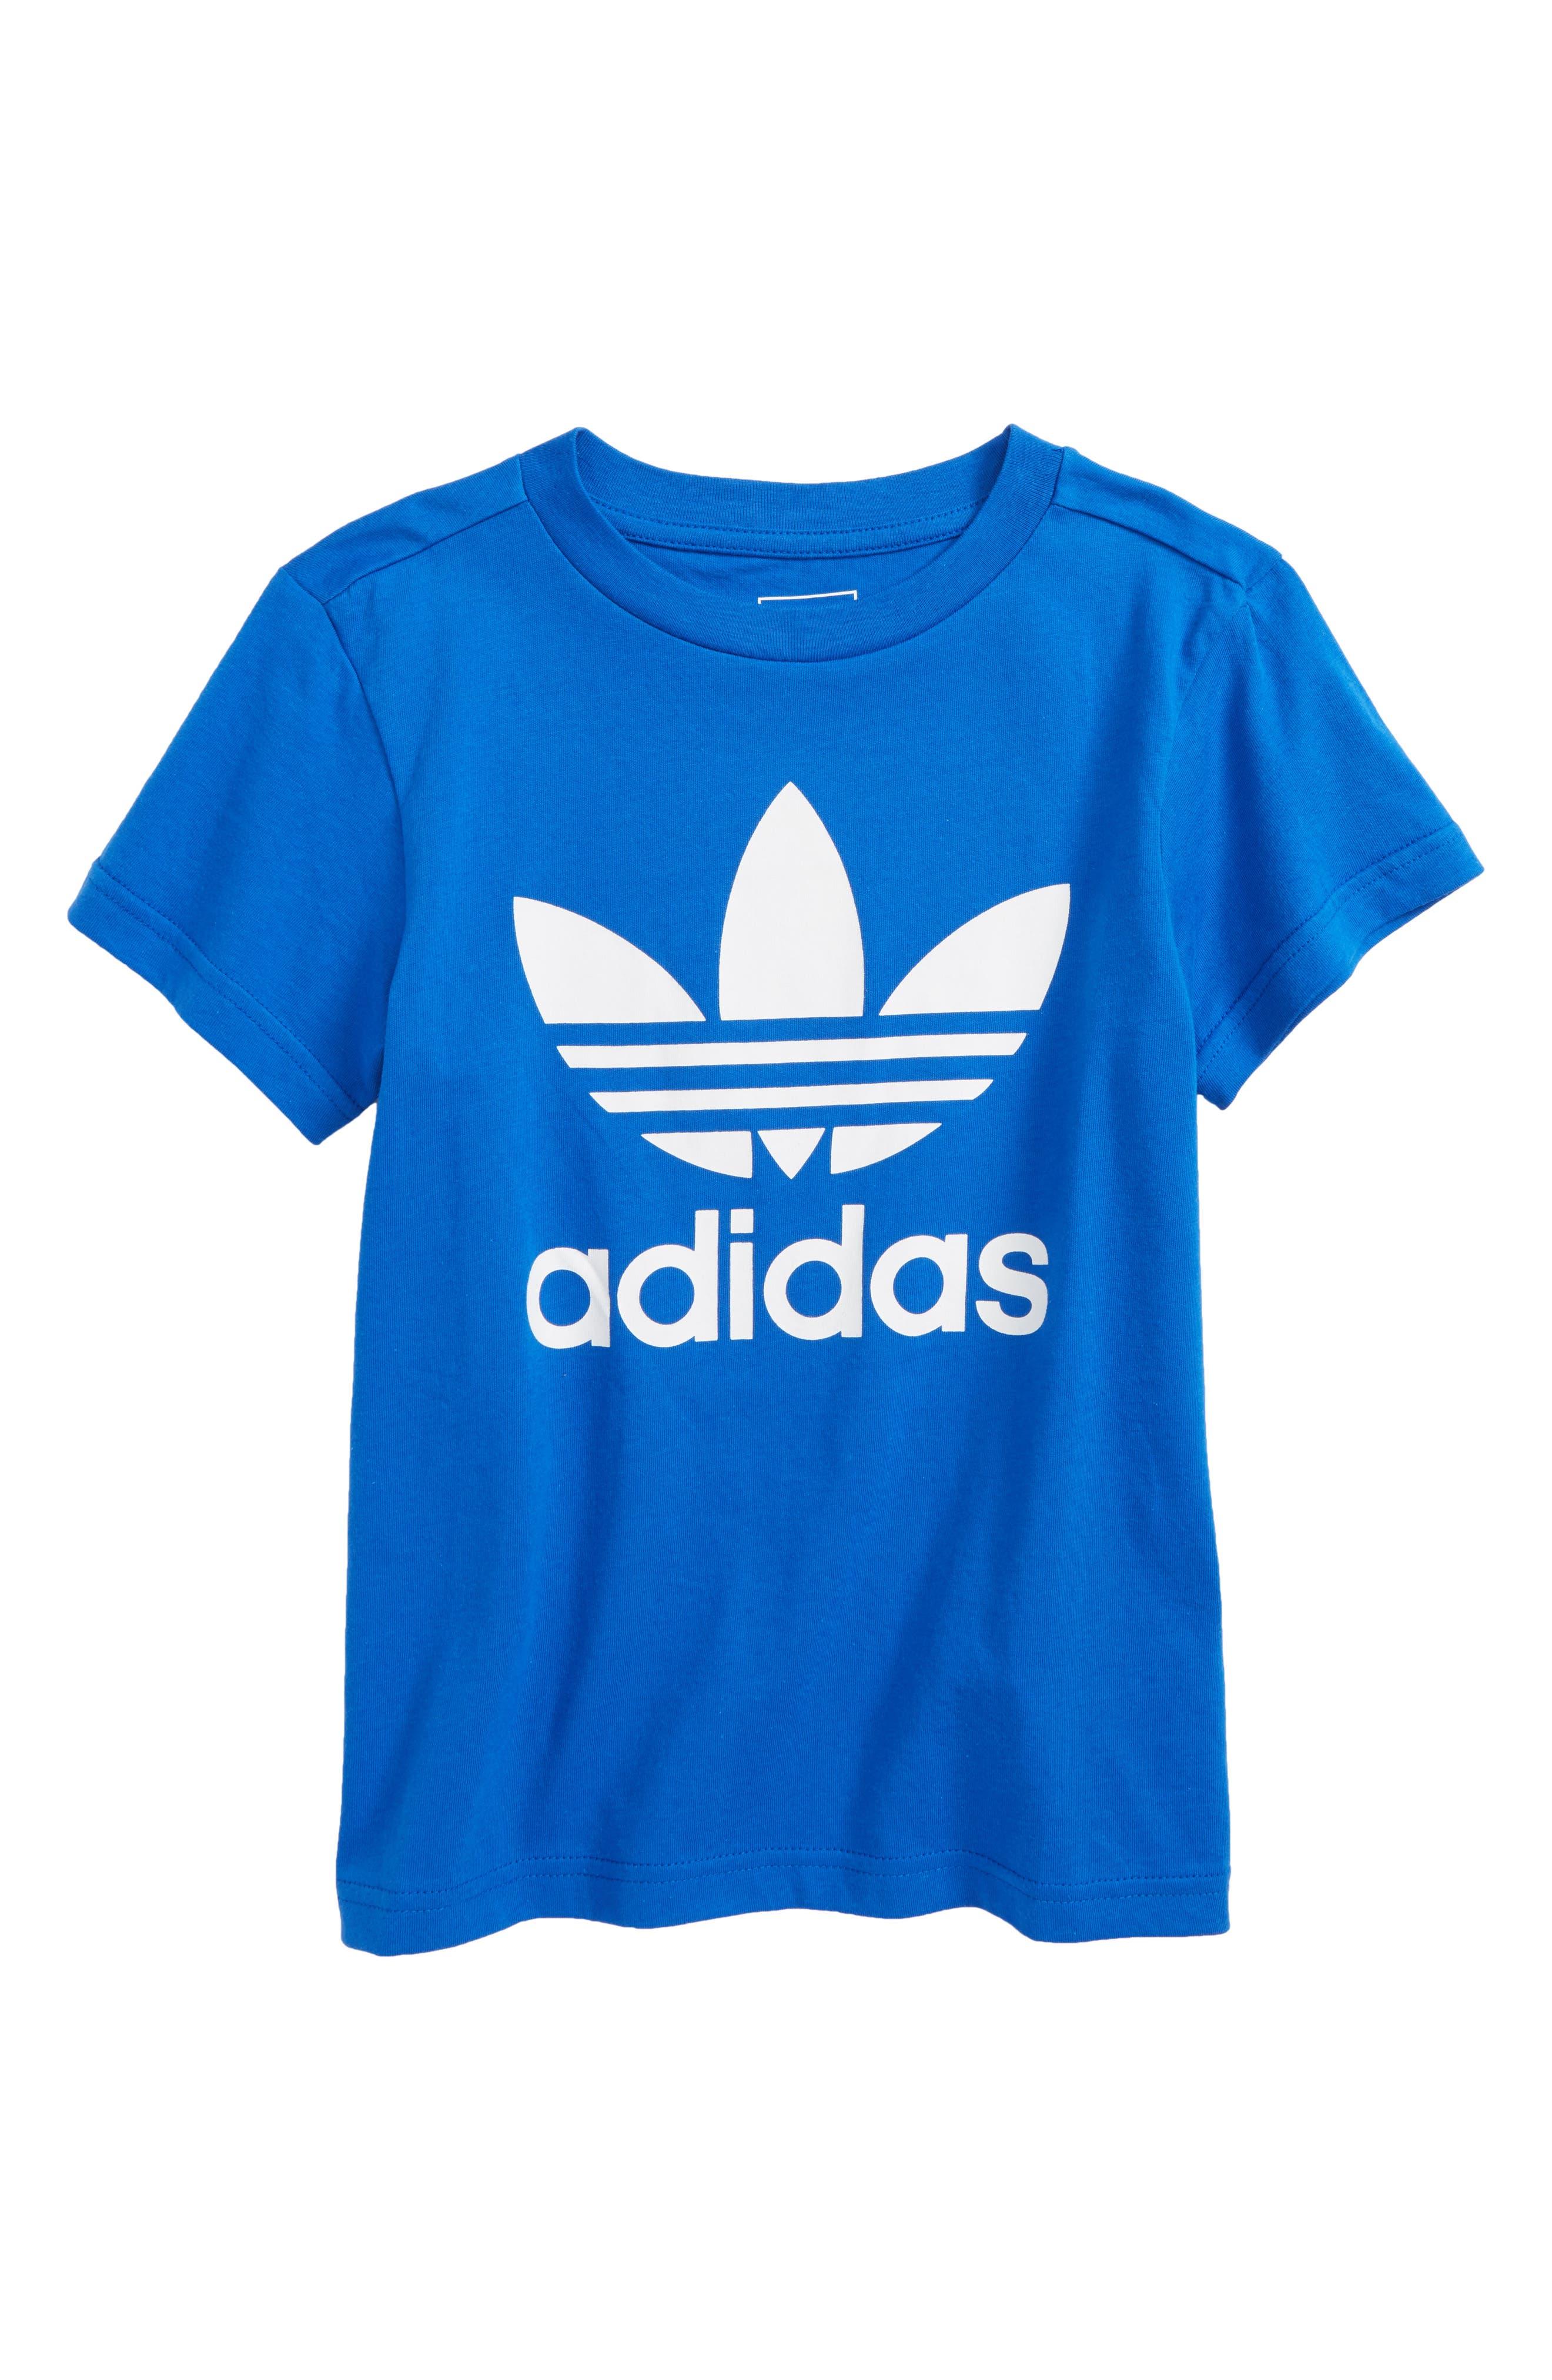 Alternate Image 1 Selected - adidas Trefoil Logo T-Shirt (Little Boys & Big Boys)